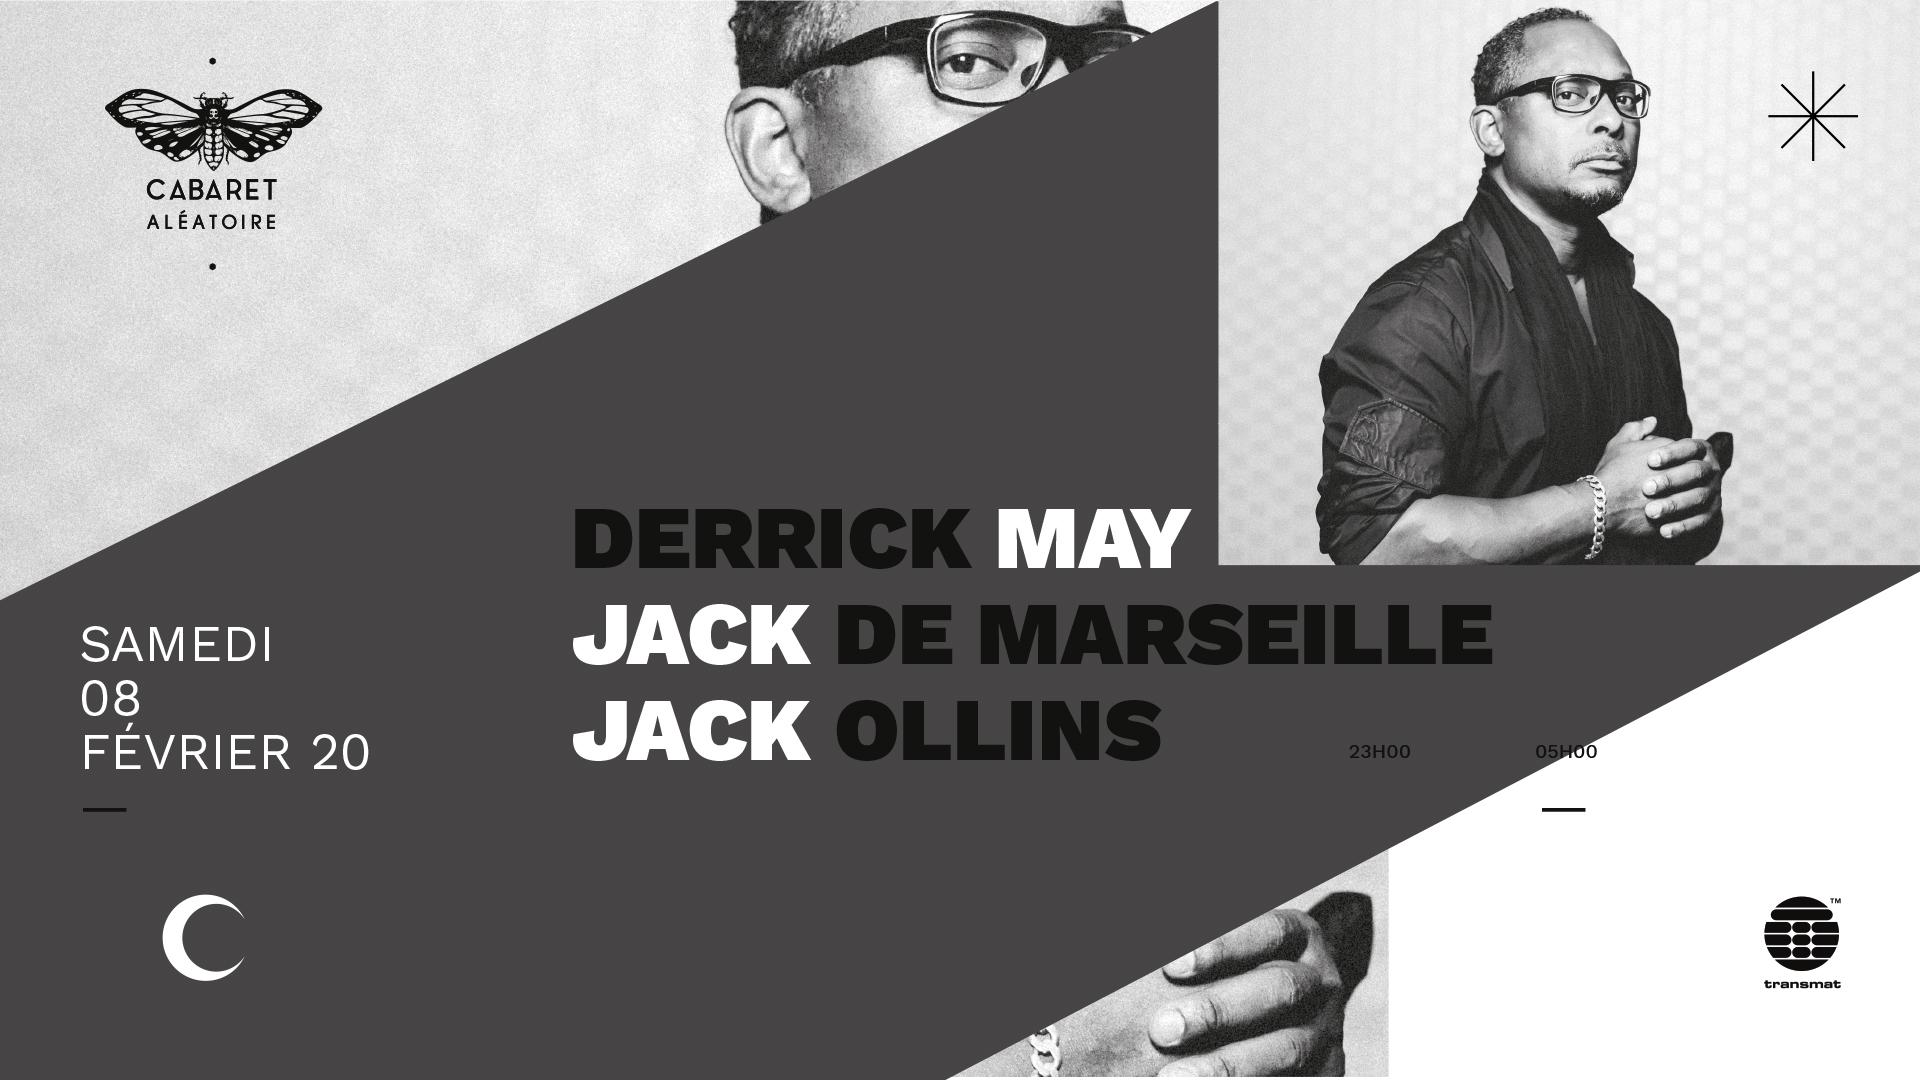 DERRICK MAY + JACK DE MARSEILLE + JACK OLLINS